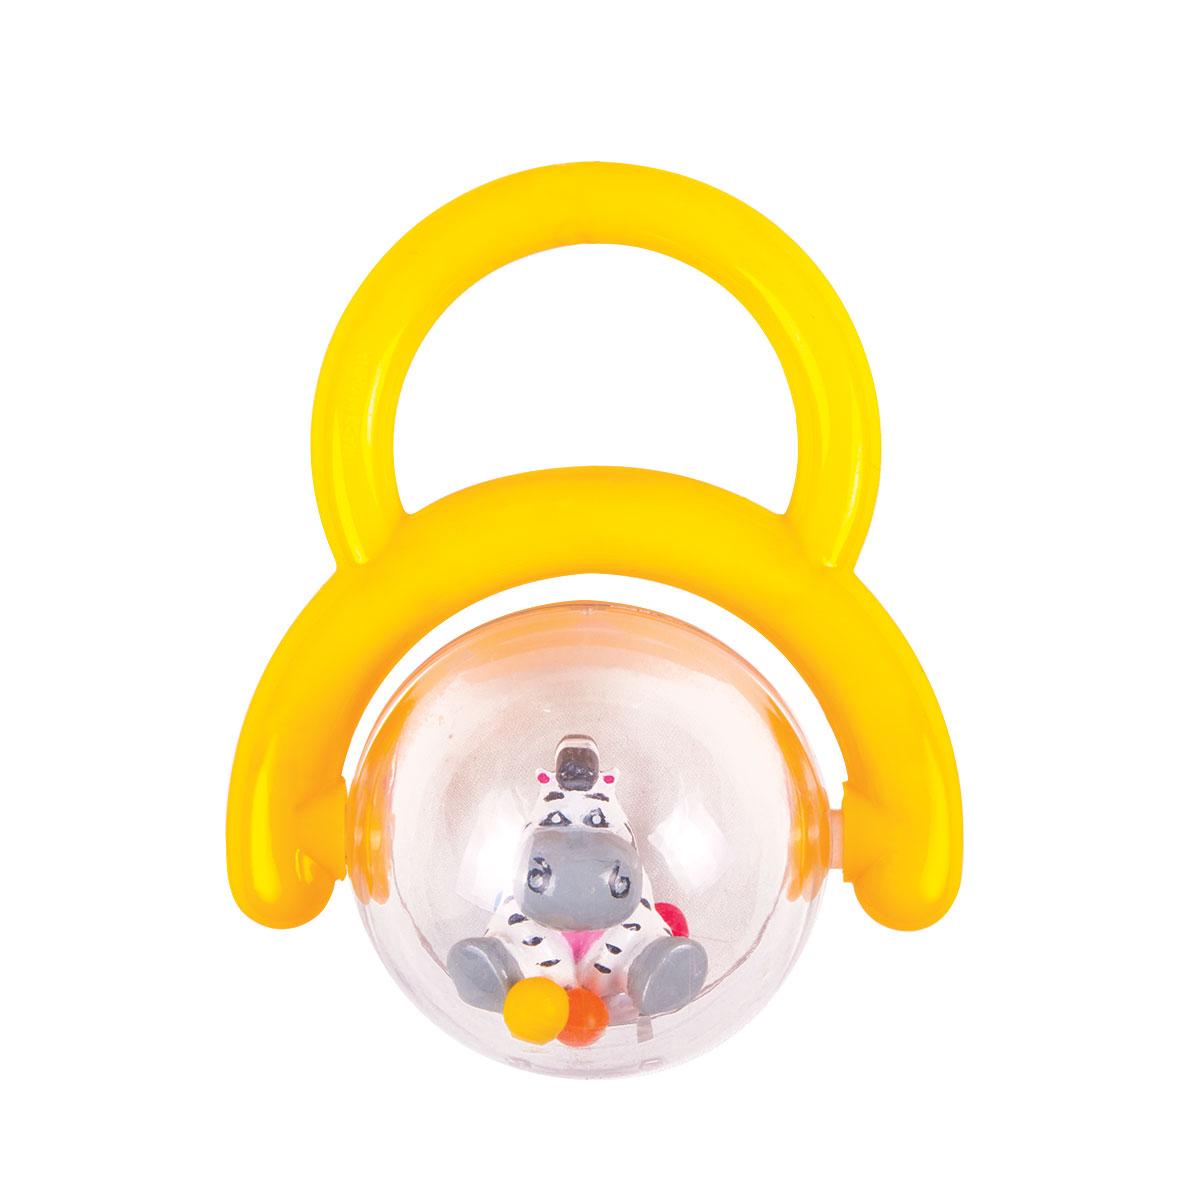 Happy Snail Погремушка с ручкой Зебра Фру-Фру golden snail 72v60v